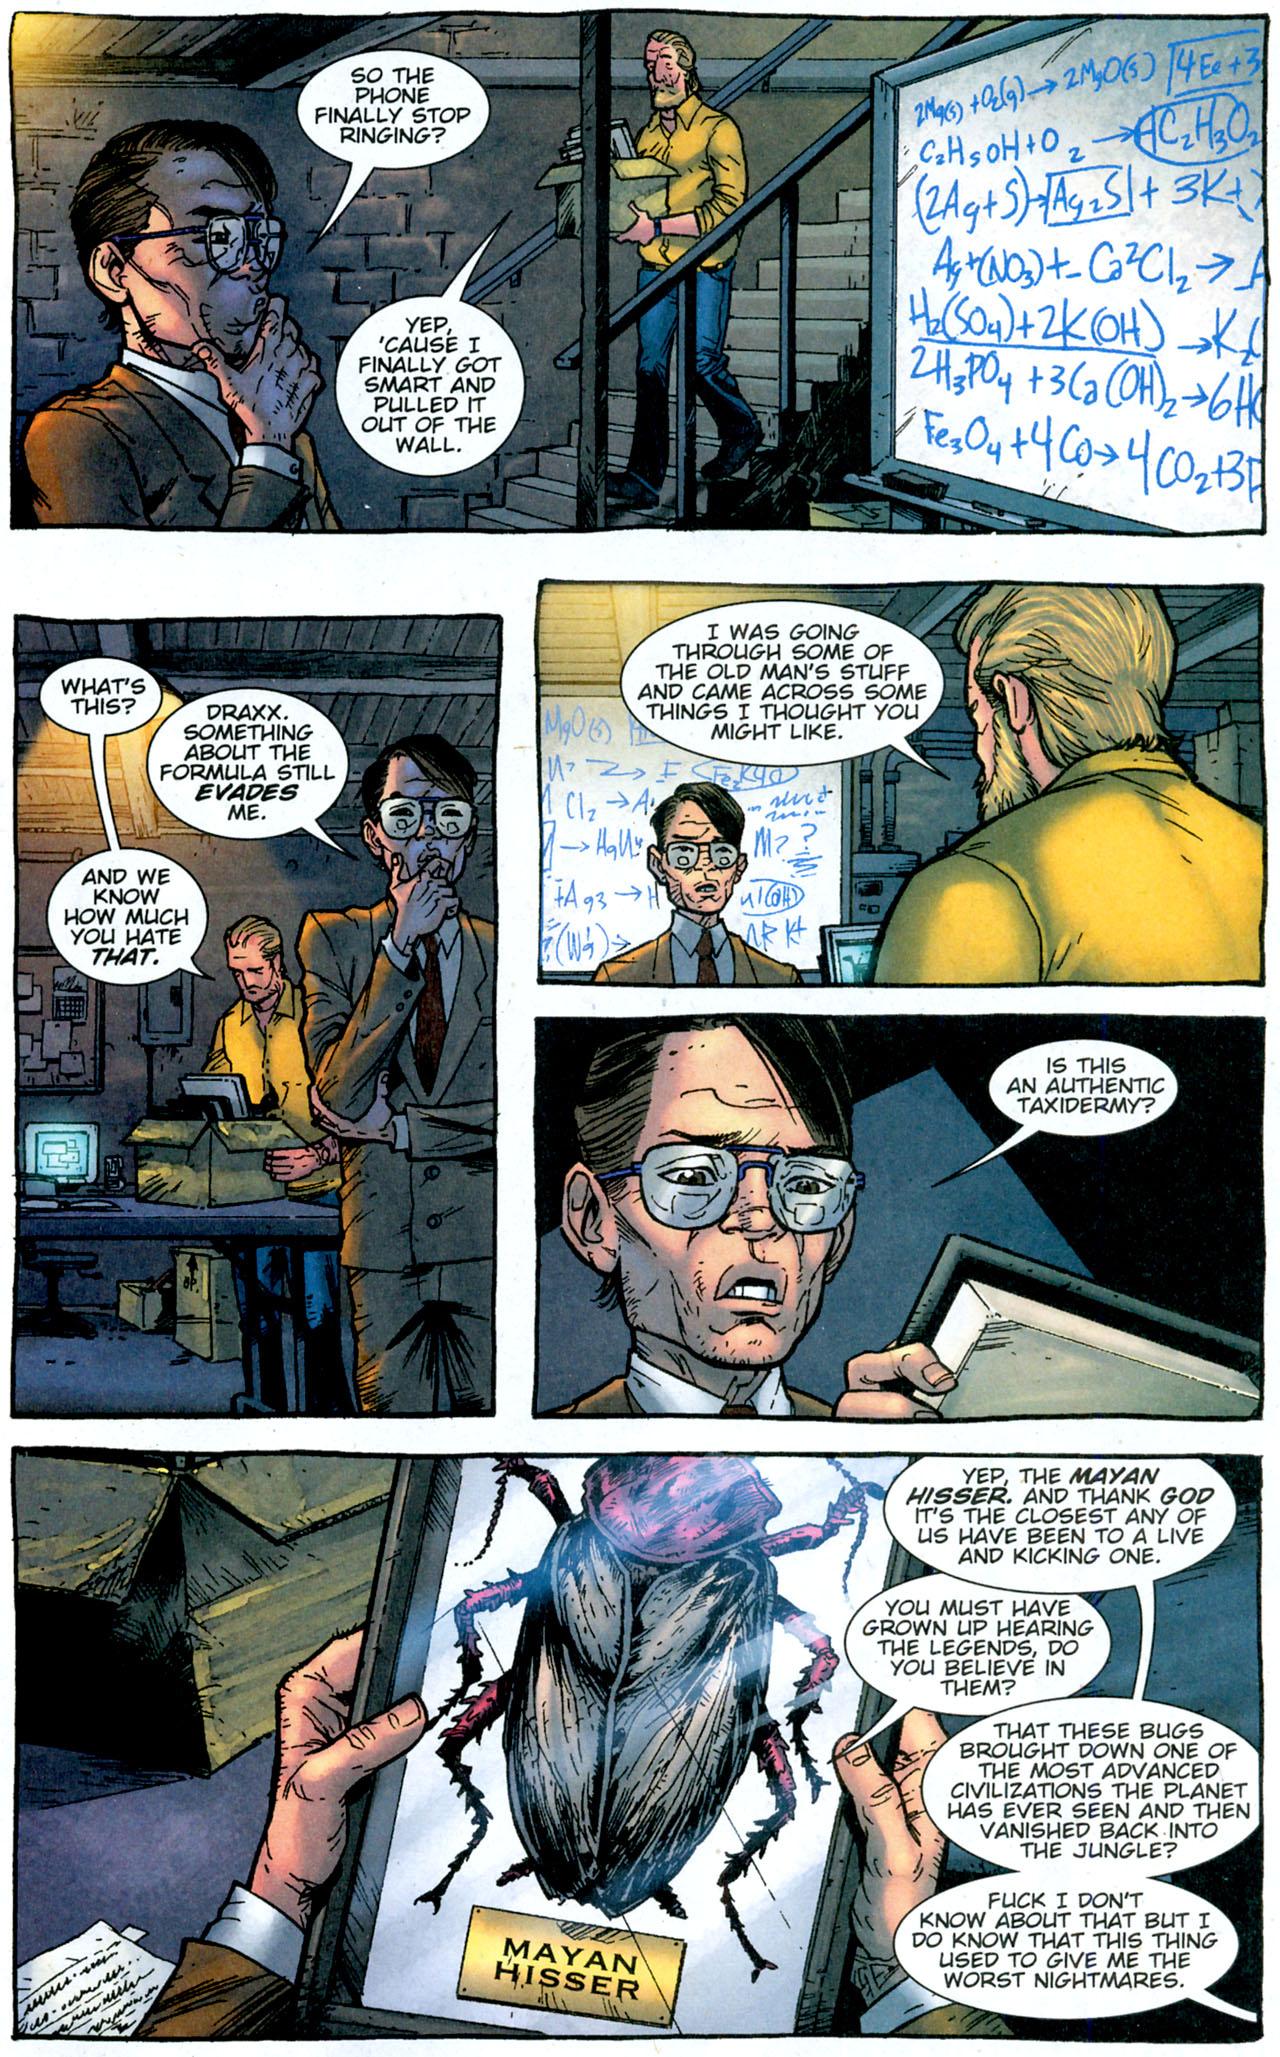 Read online The Exterminators comic -  Issue #14 - 14